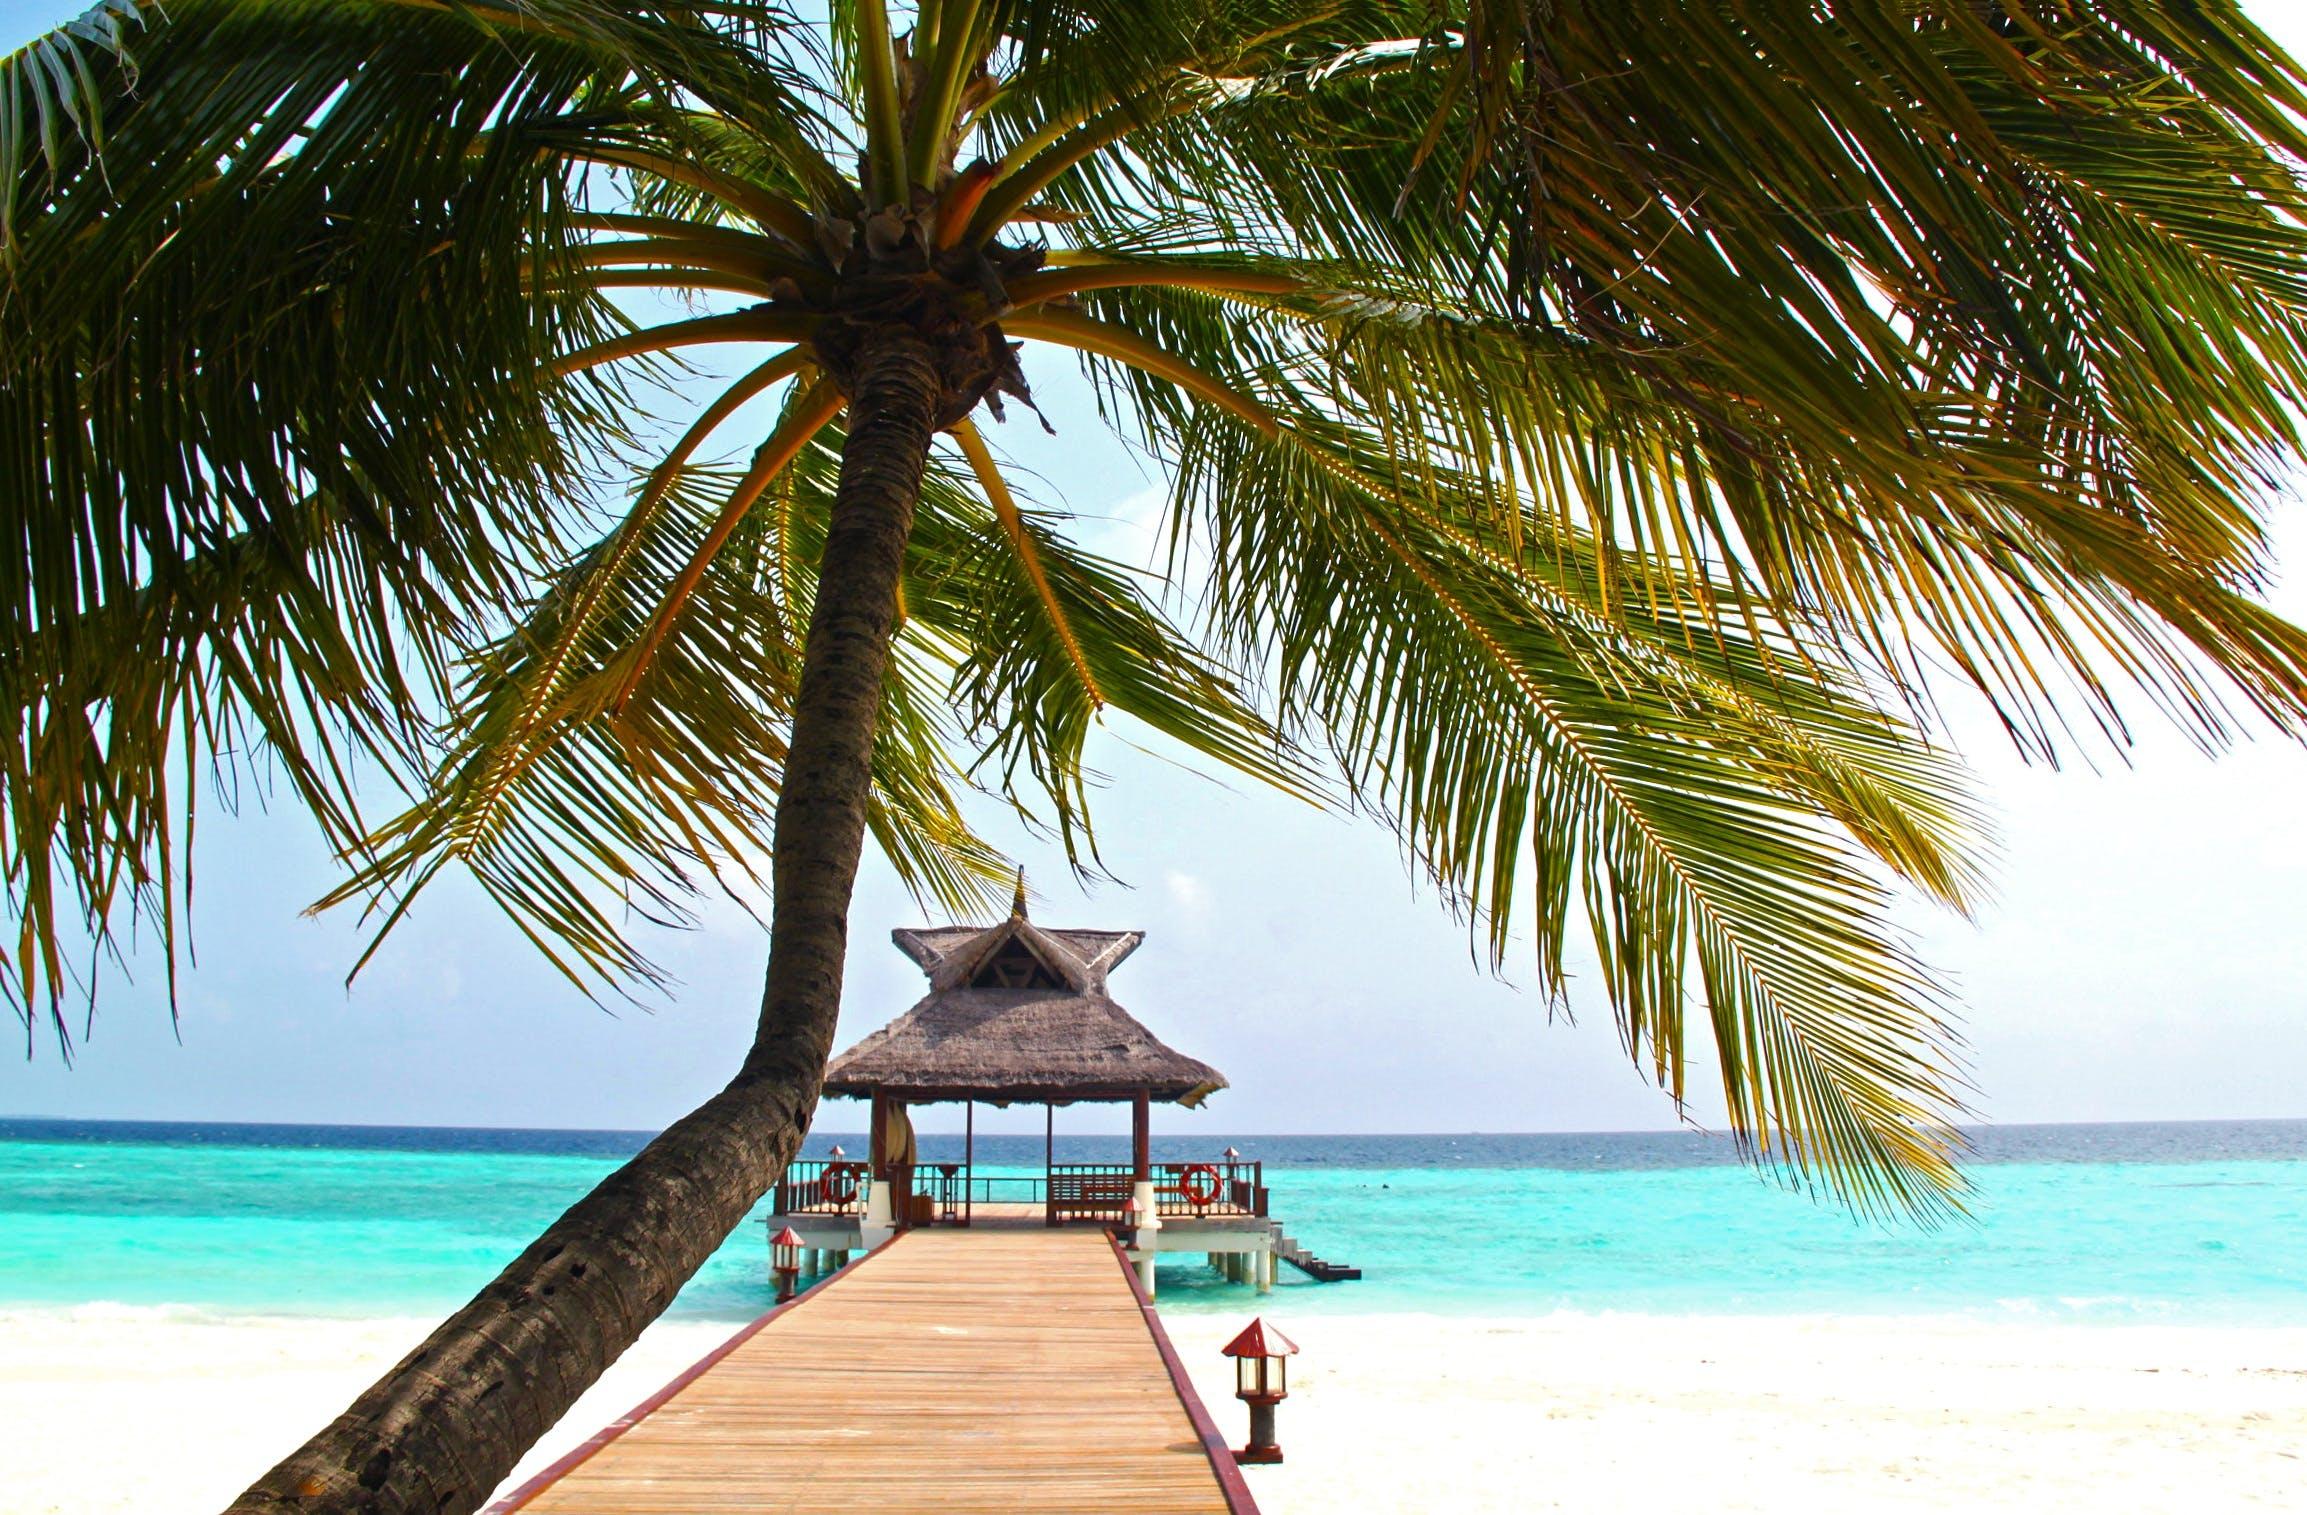 Beach Dock With Palm Tree